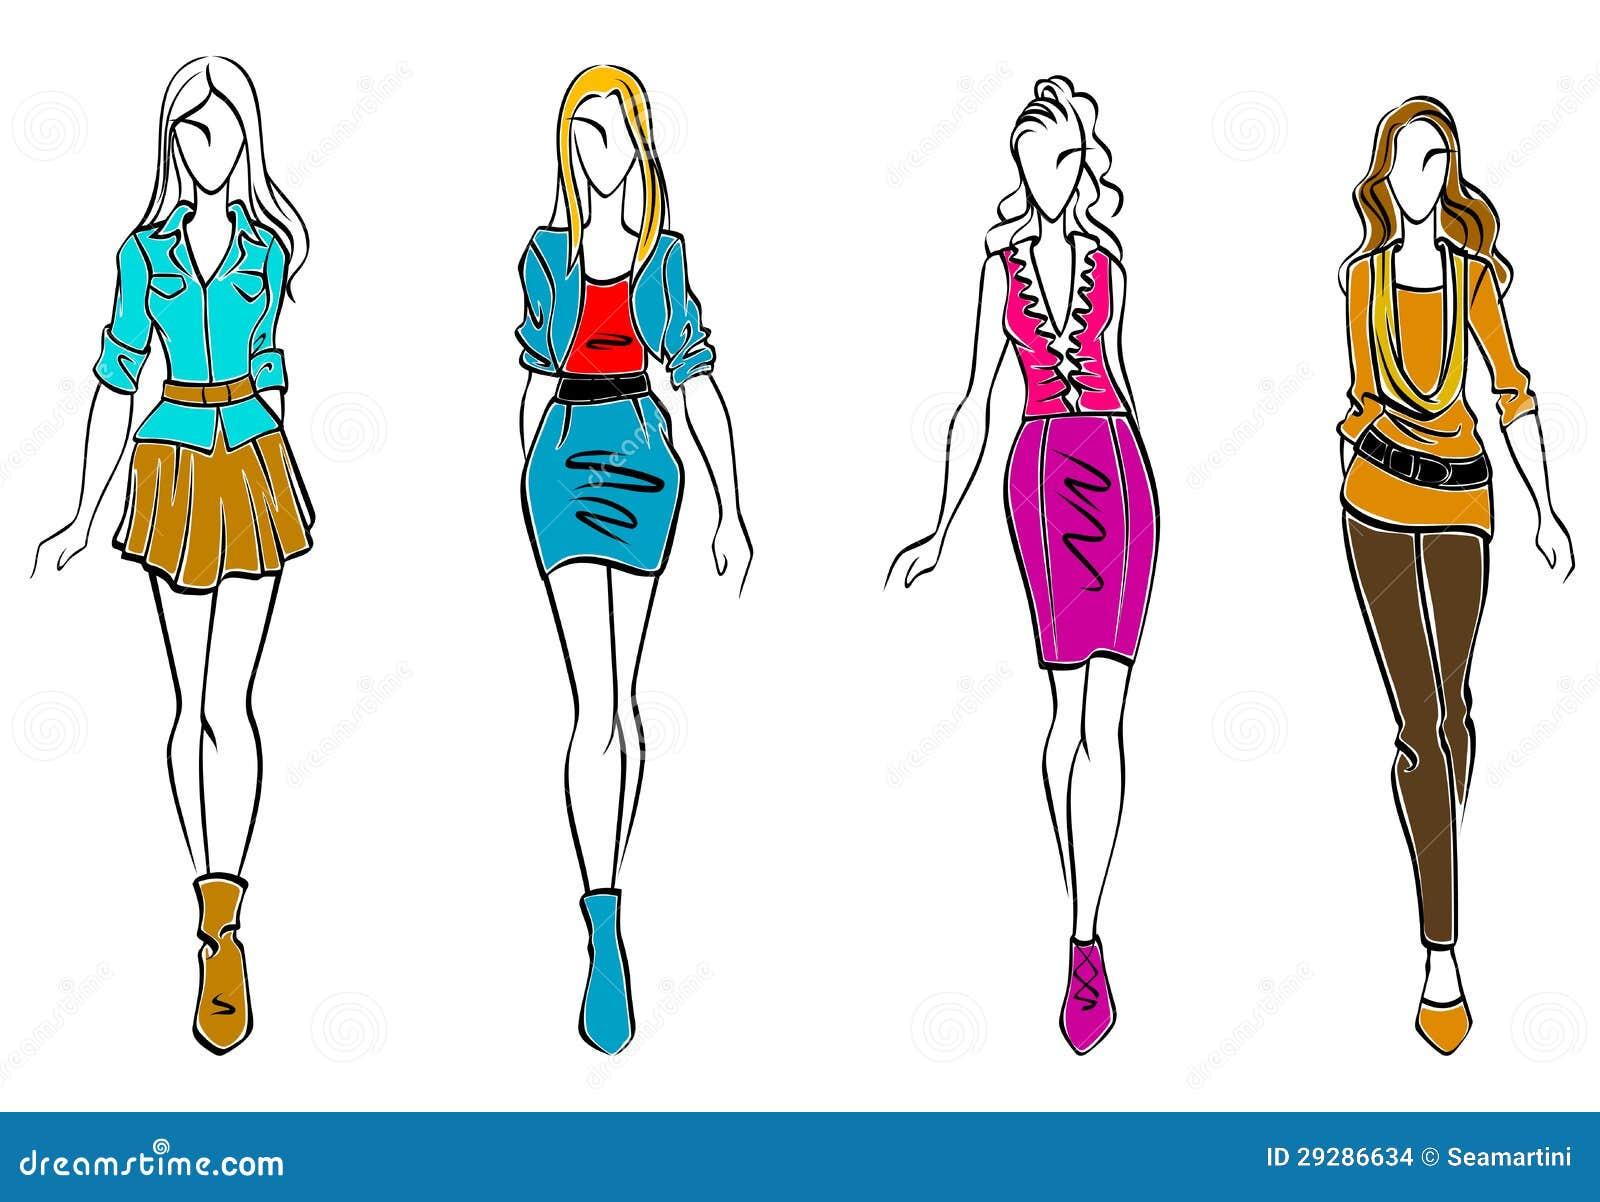 Fashion Design Drawing Course Pdf